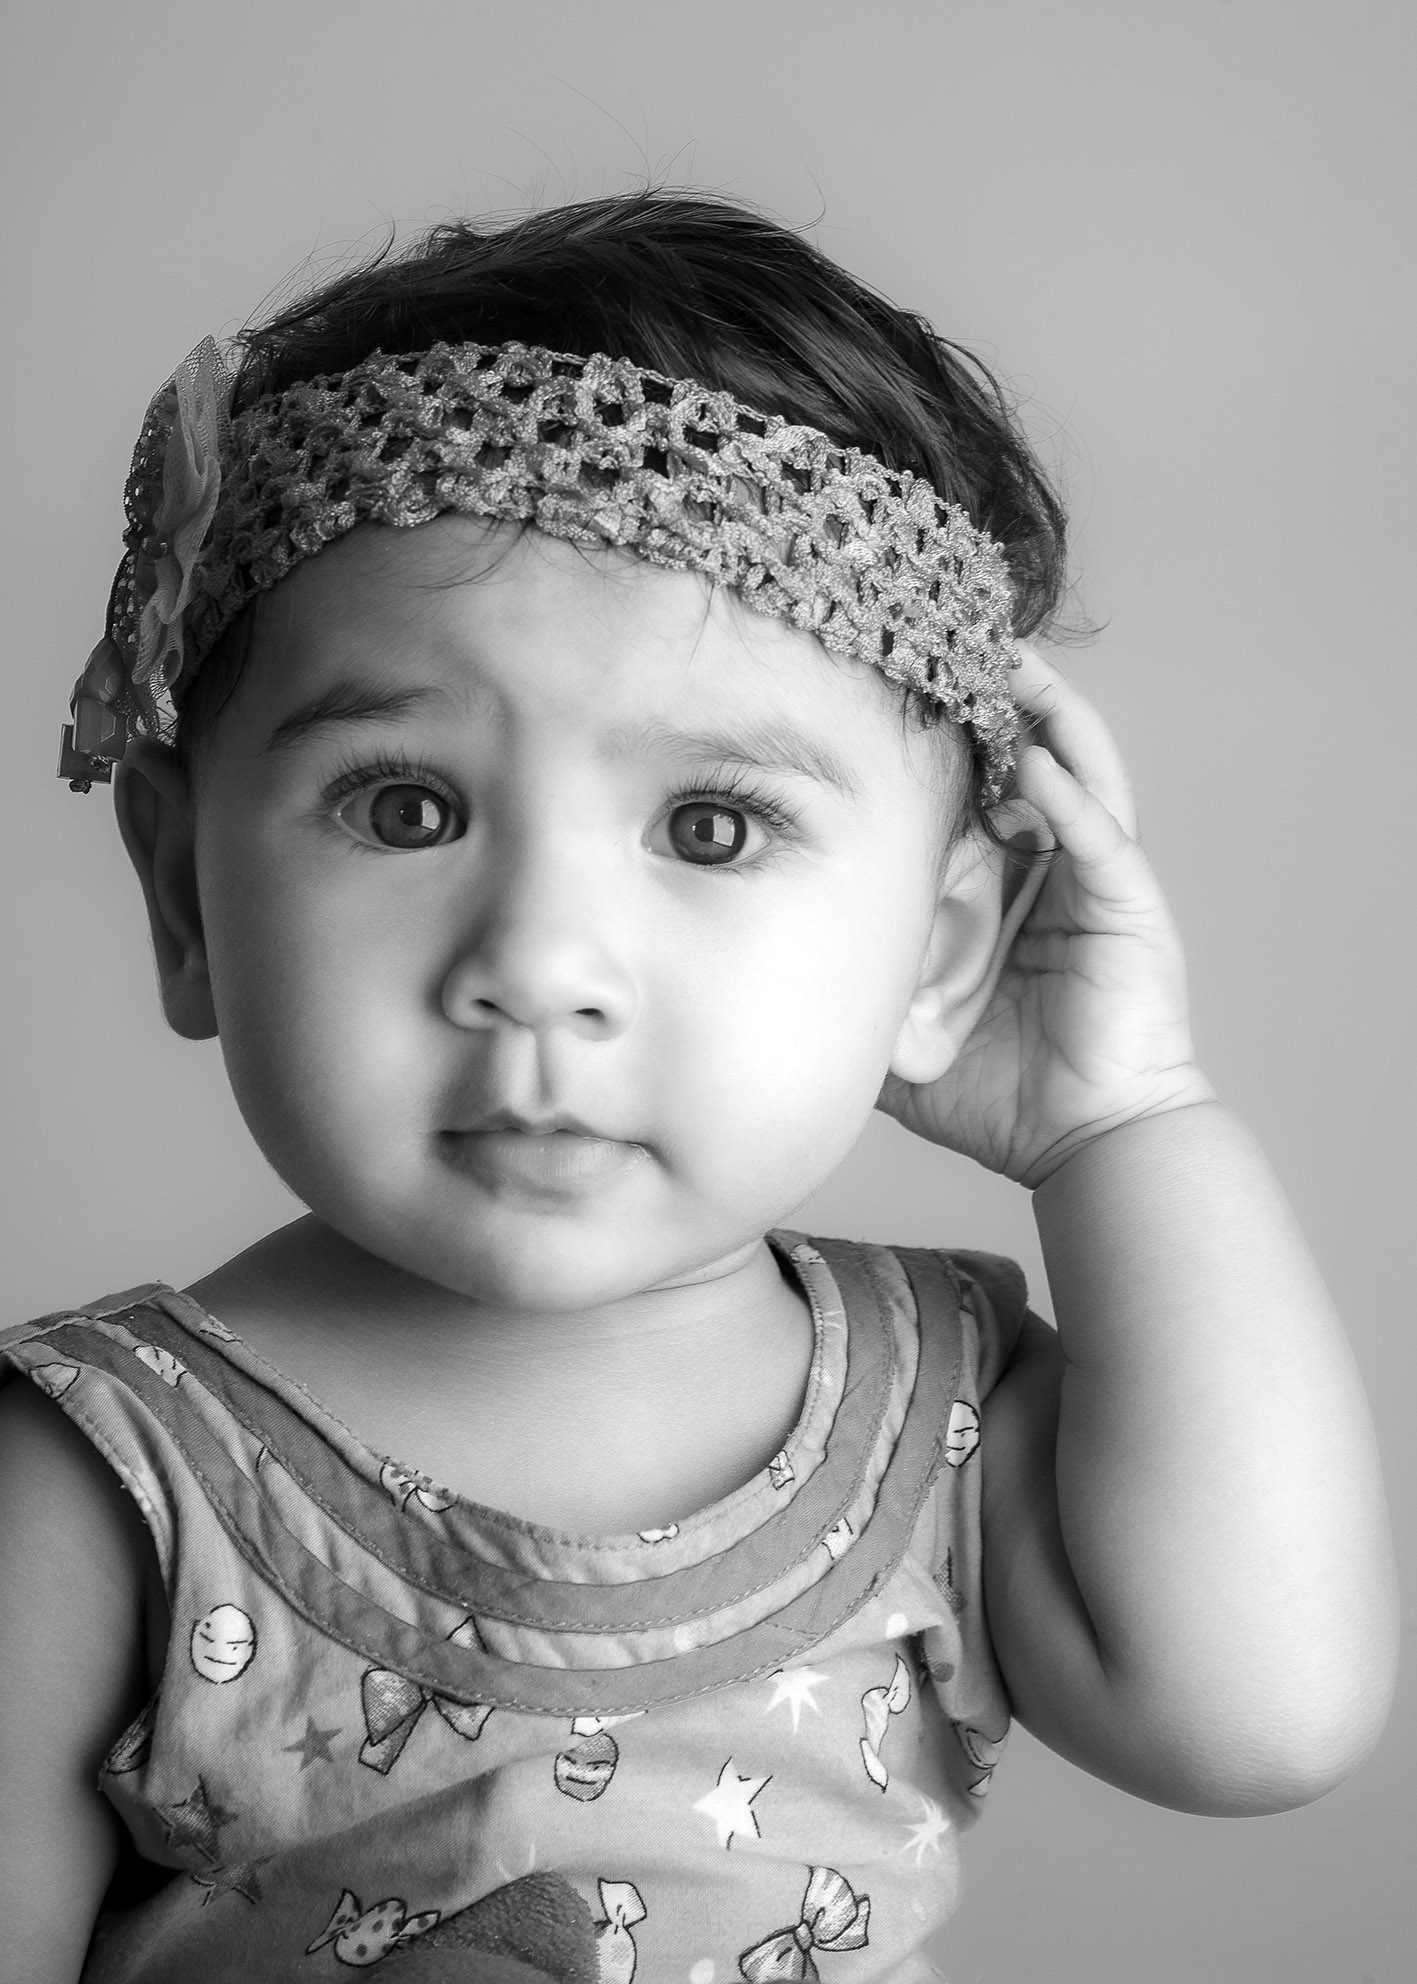 Studio Light by Azhar | Kids, New Born, Infant Photography | Azhar Photography.jpg